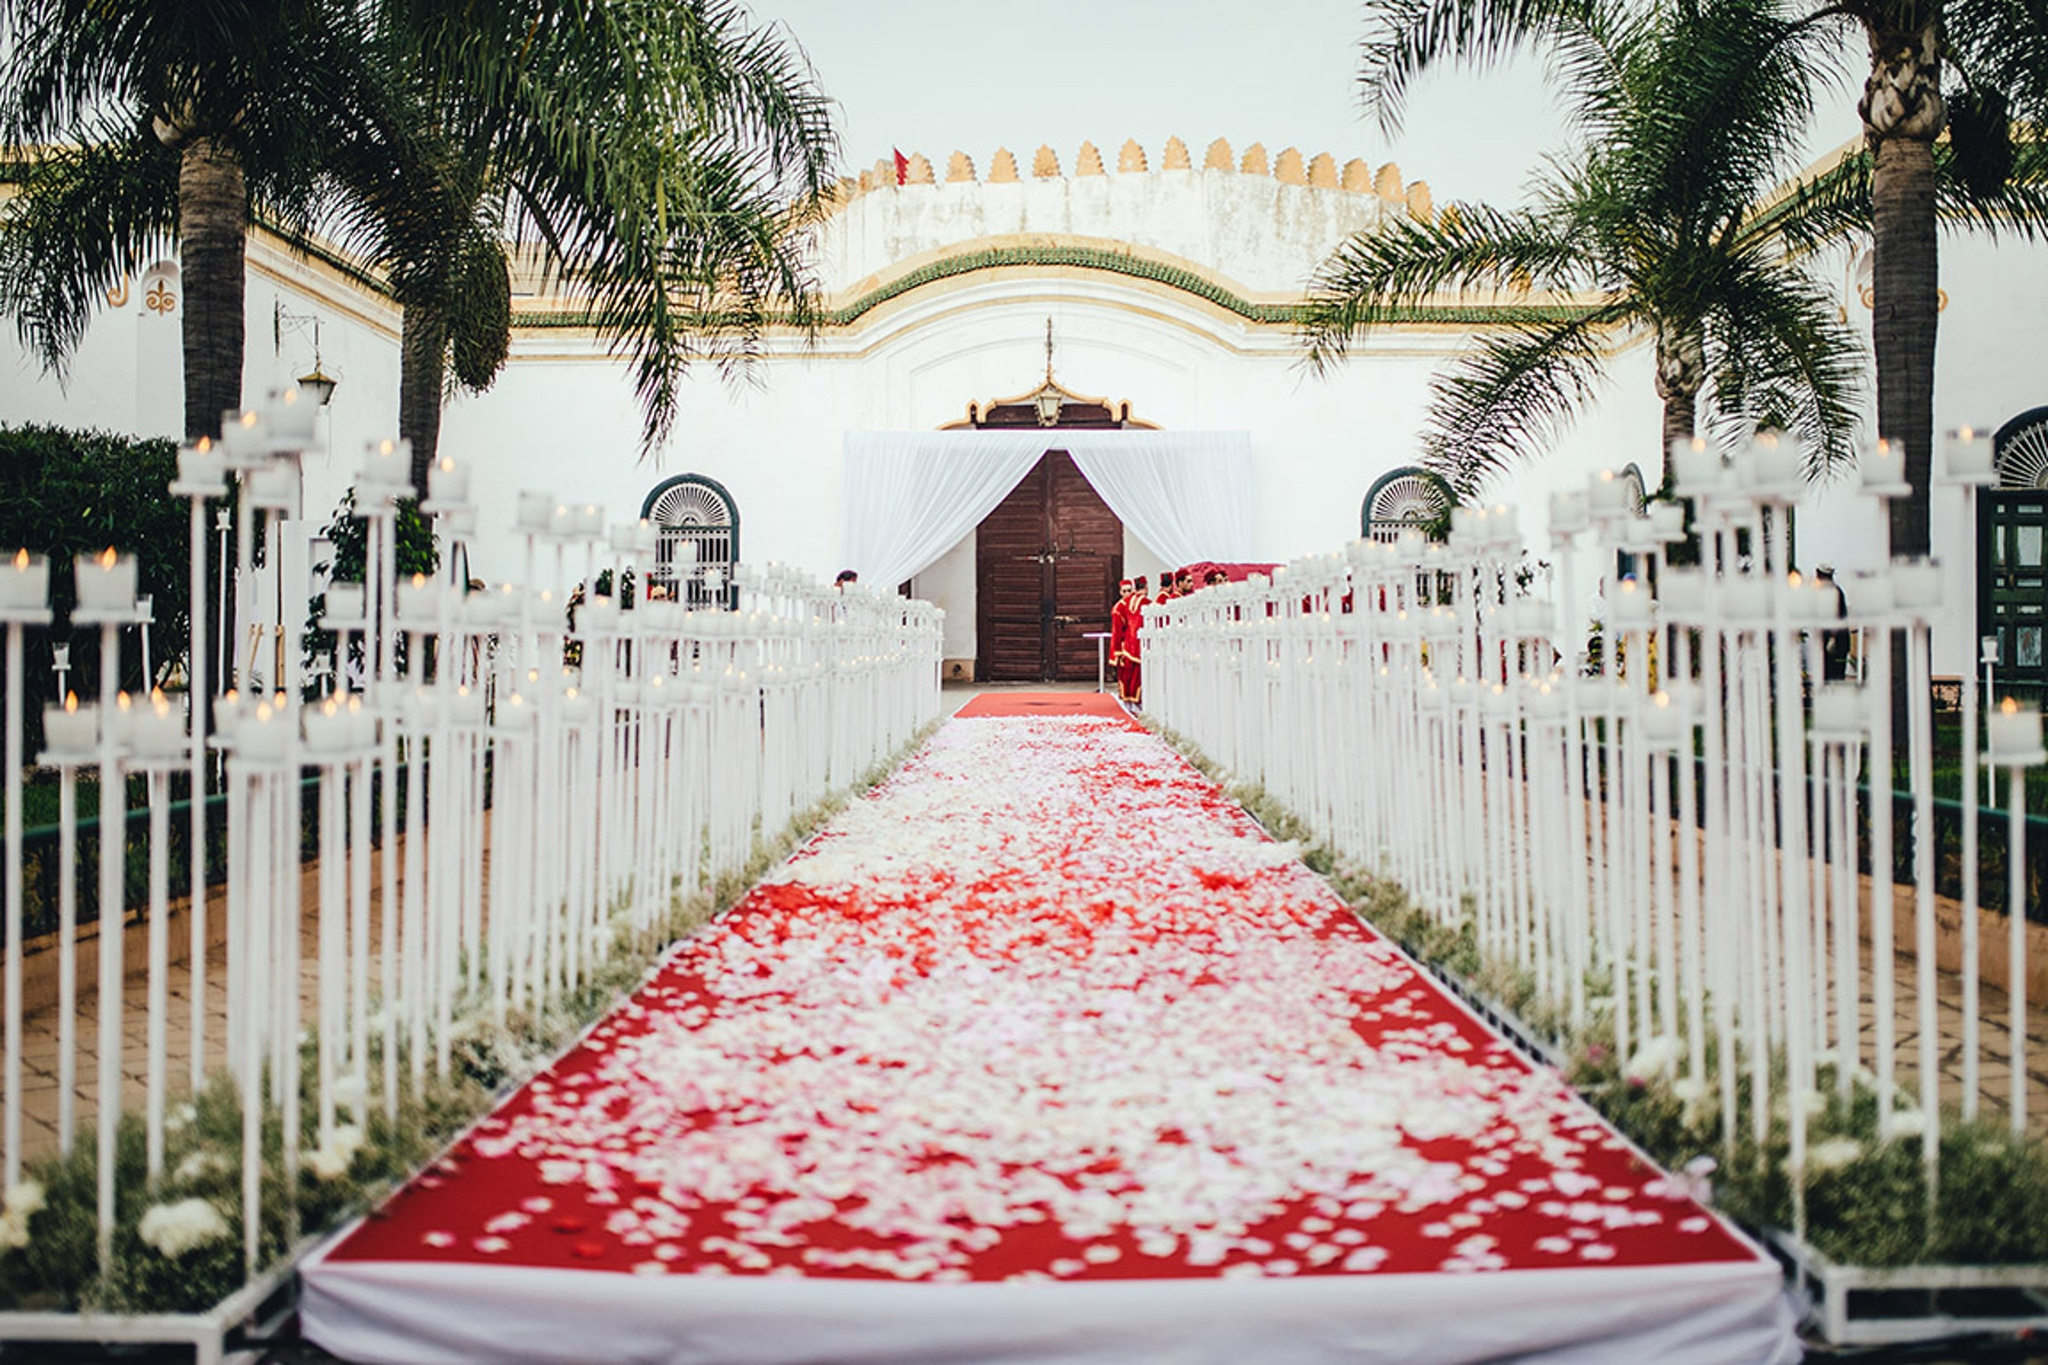 Moroccan Theme Wedding Aisle